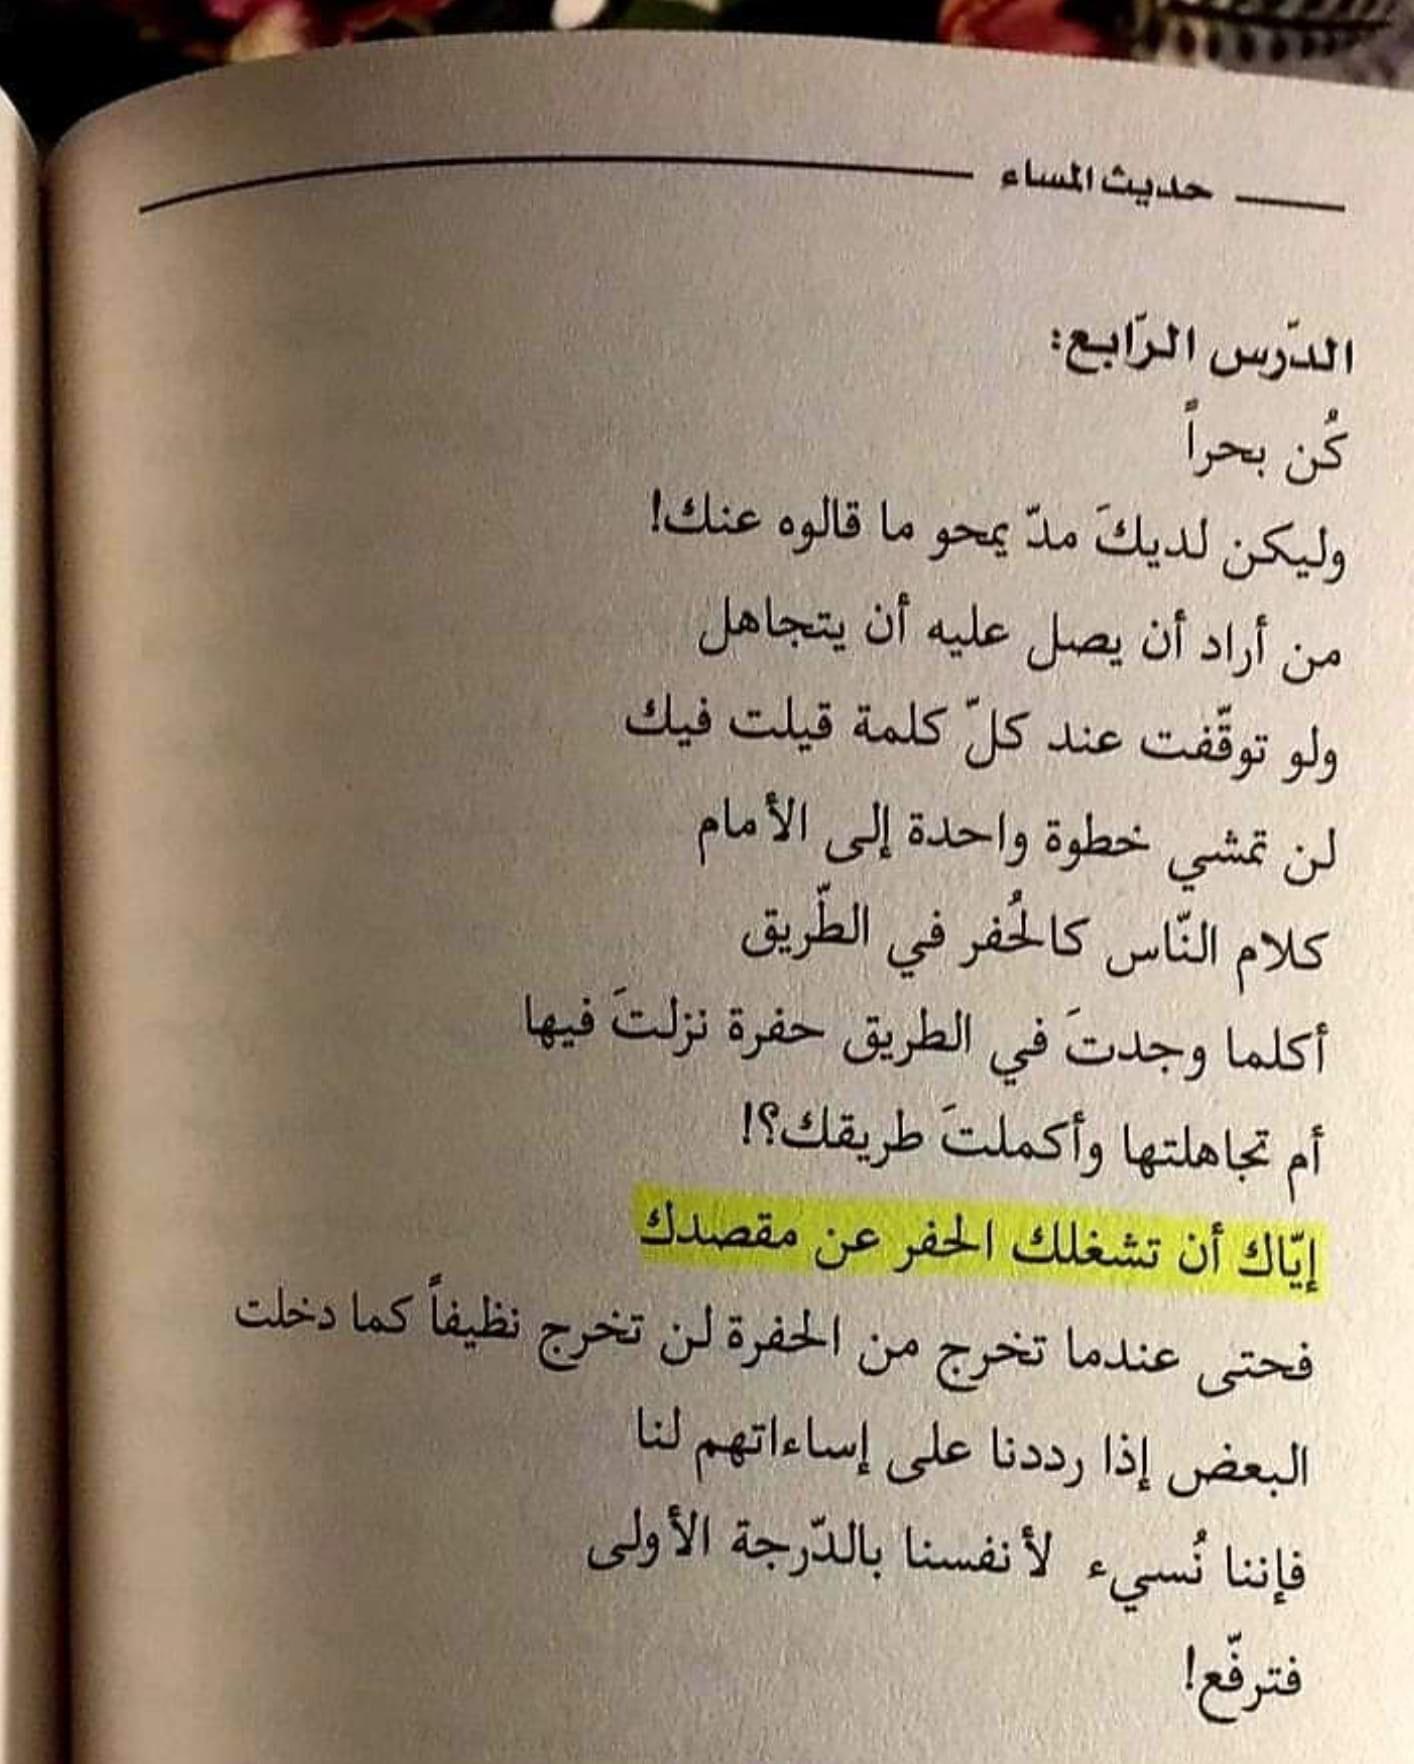 Pin By Maha Shaheen On اقتباسات كتب Love Quotes Words Of Wisdom Quotes